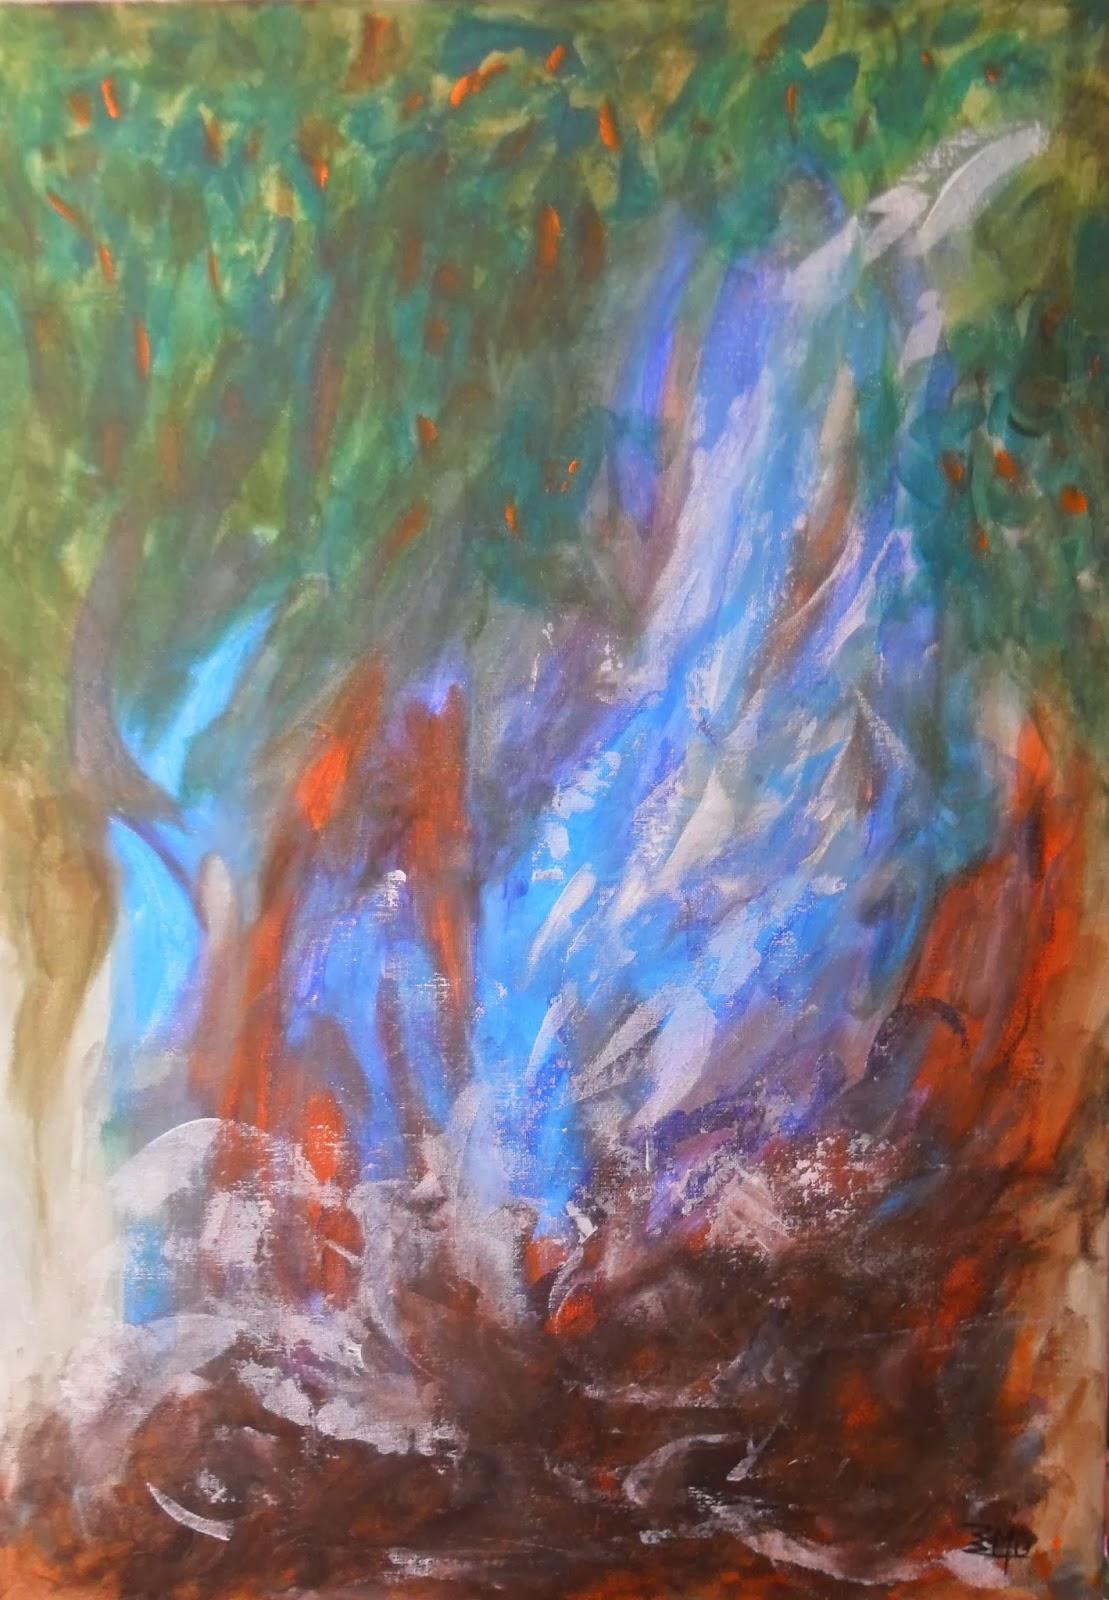 expresionismo abstracto - eliasmonsalve.com  @eliasmons